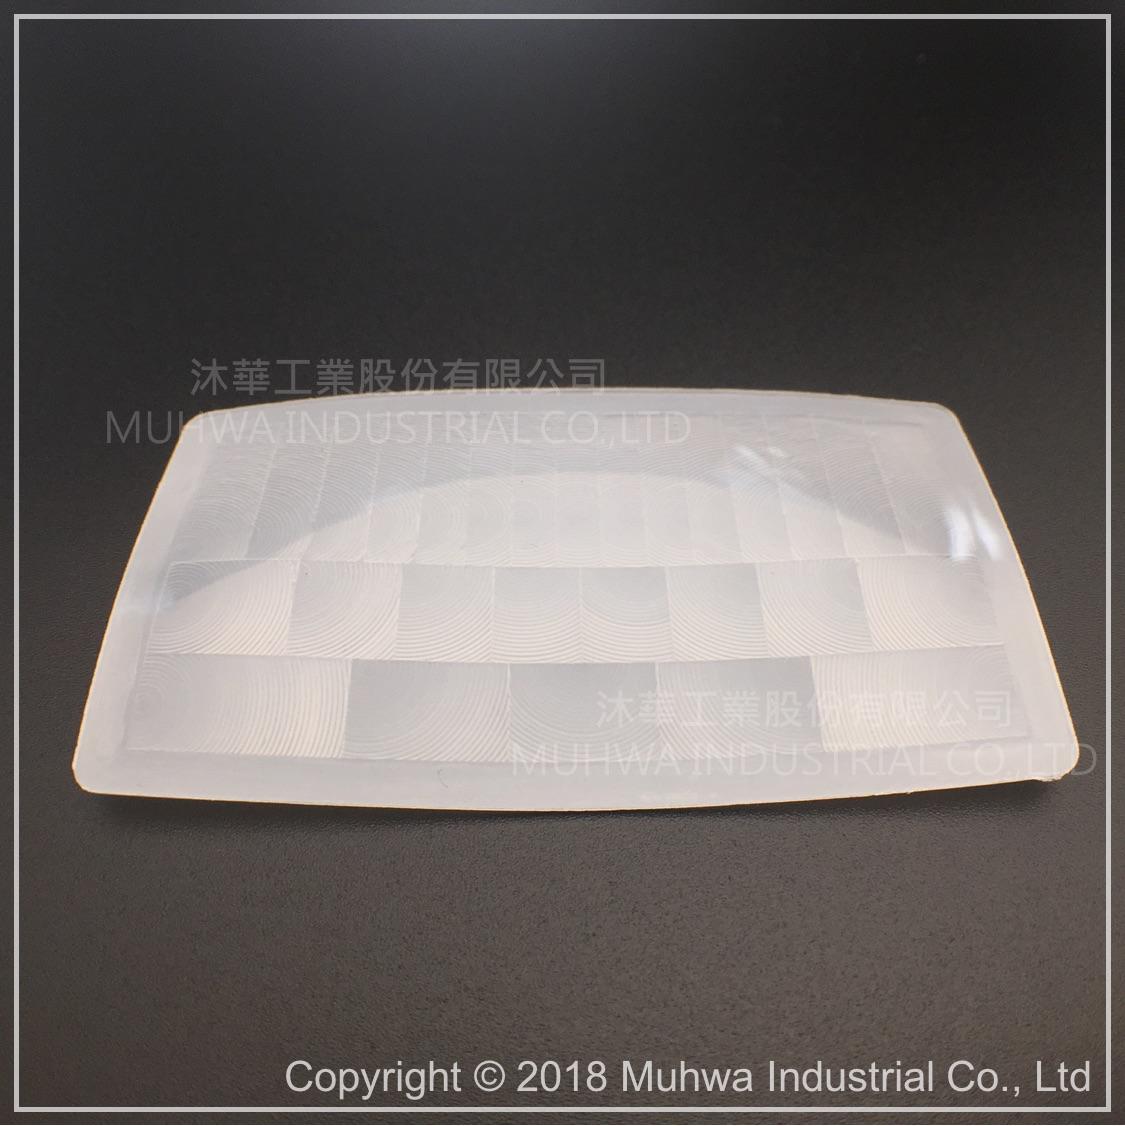 MH8001-1.jpg